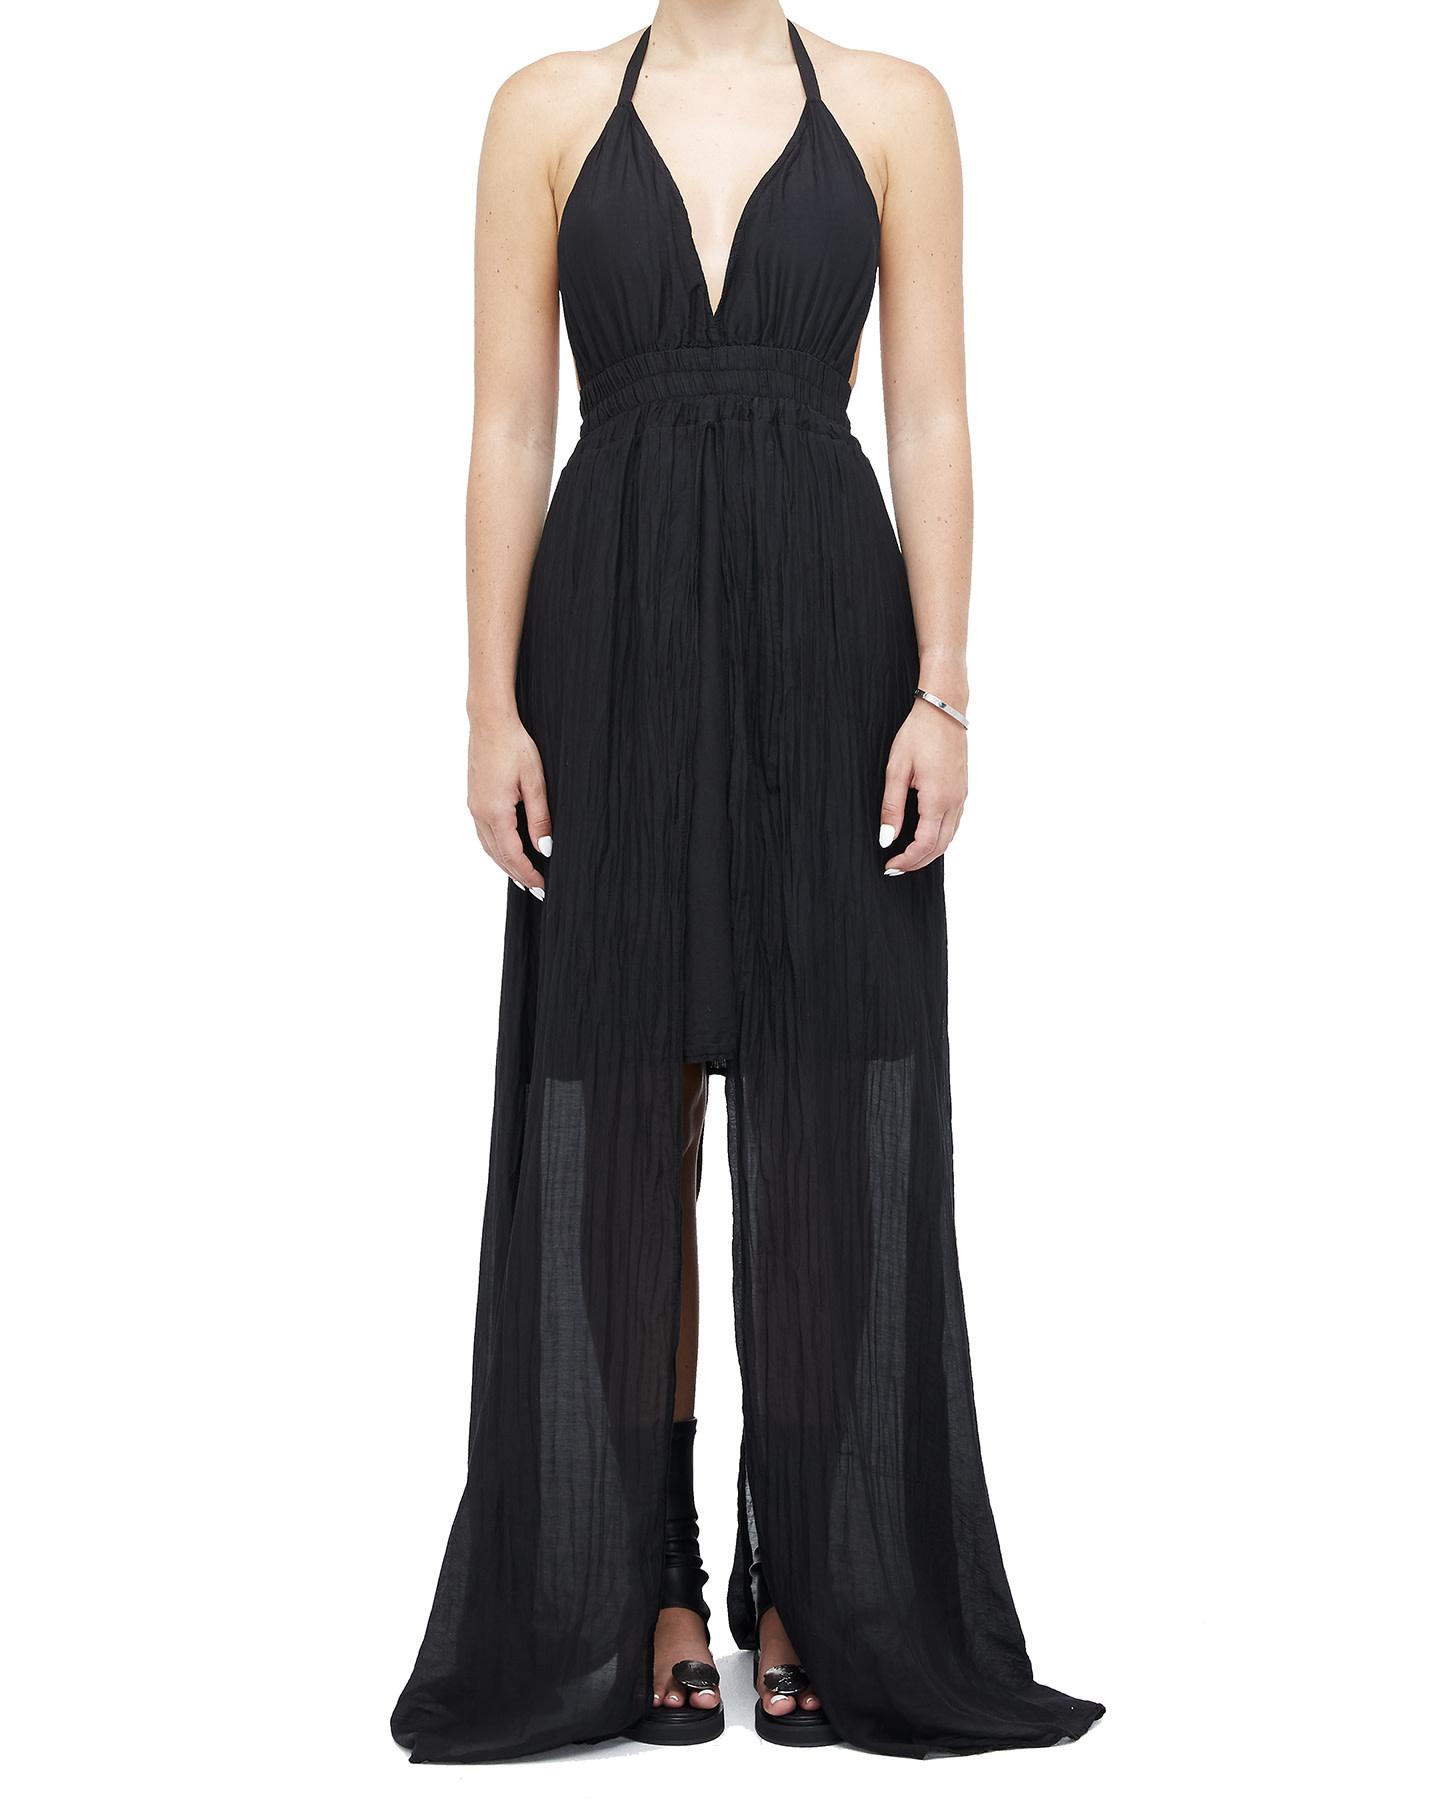 COTTON & SILK GAUZE LAYERED DRESS - BLACK